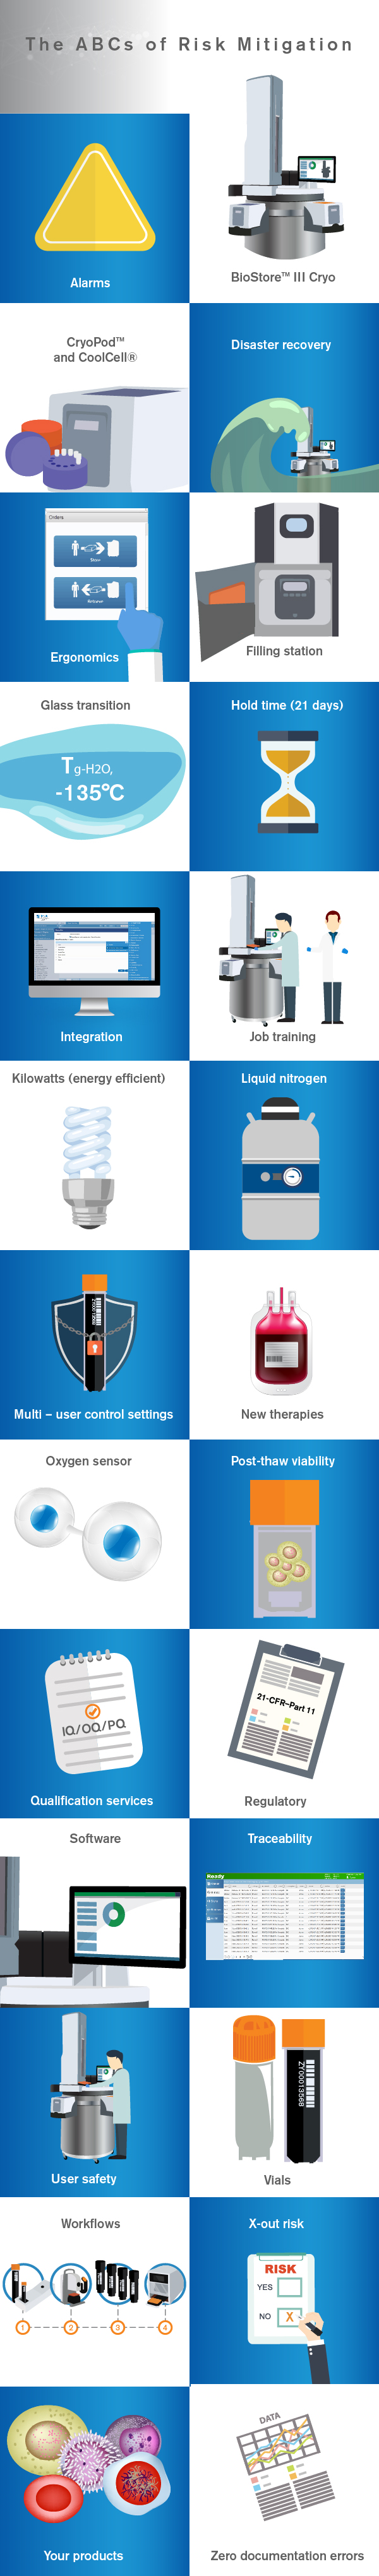 TEST-Popover-infographic